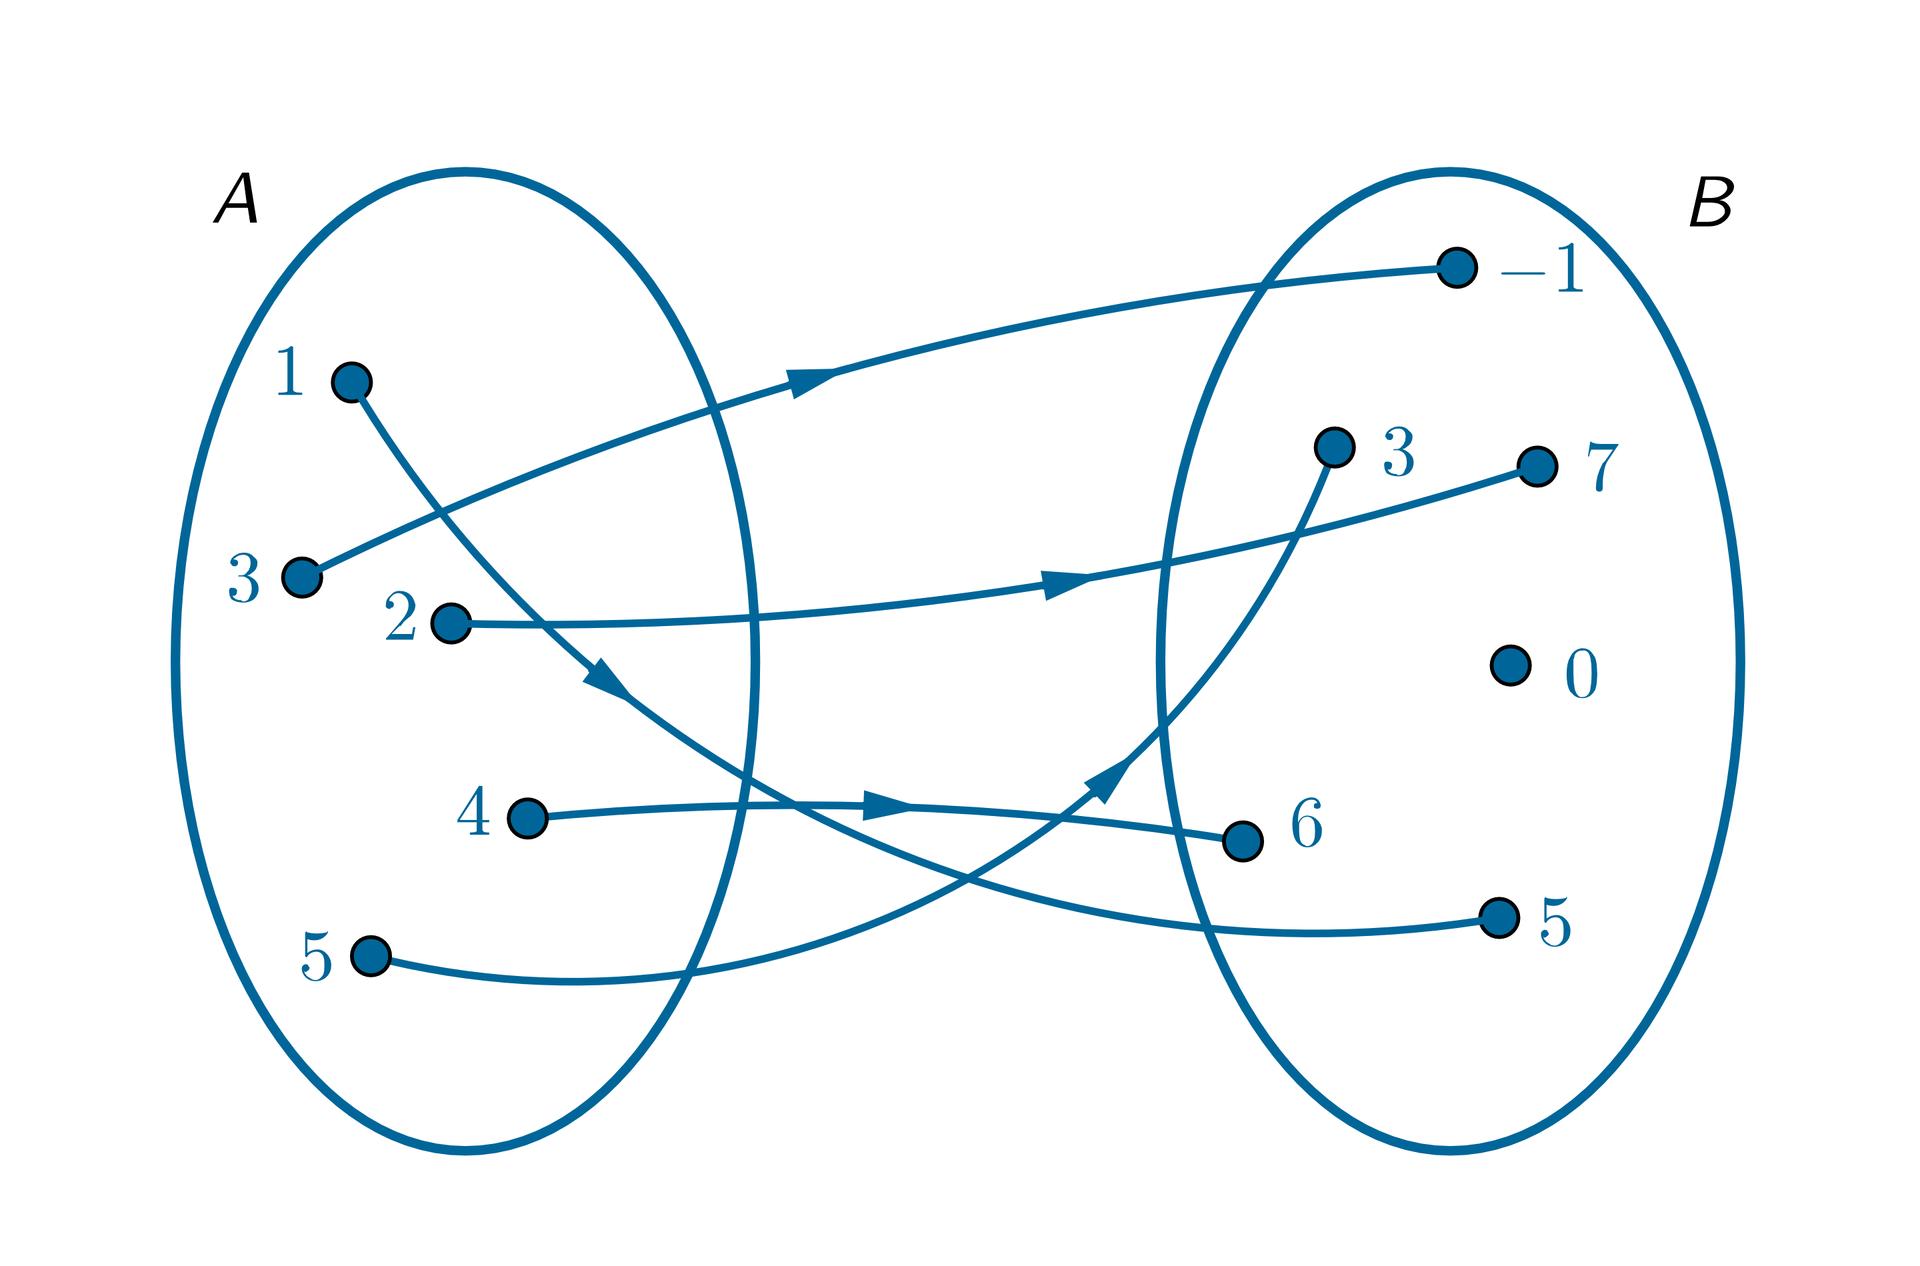 Graf pokazuje zbiór A={1, 2, 3, 4, 5}. Zbiór B={-1, 0, 3, 5, 6, 7}. Argumentowi 1 przyporządkowano wartość 5. Argumentowi 2 przyporządkowano wartość 7. Argumentowi 3 przyporządkowano wartość -1. Argumentowi 4 przyporządkowano wartość 6. Argumentowi 5 przyporządkowano wartość 3.